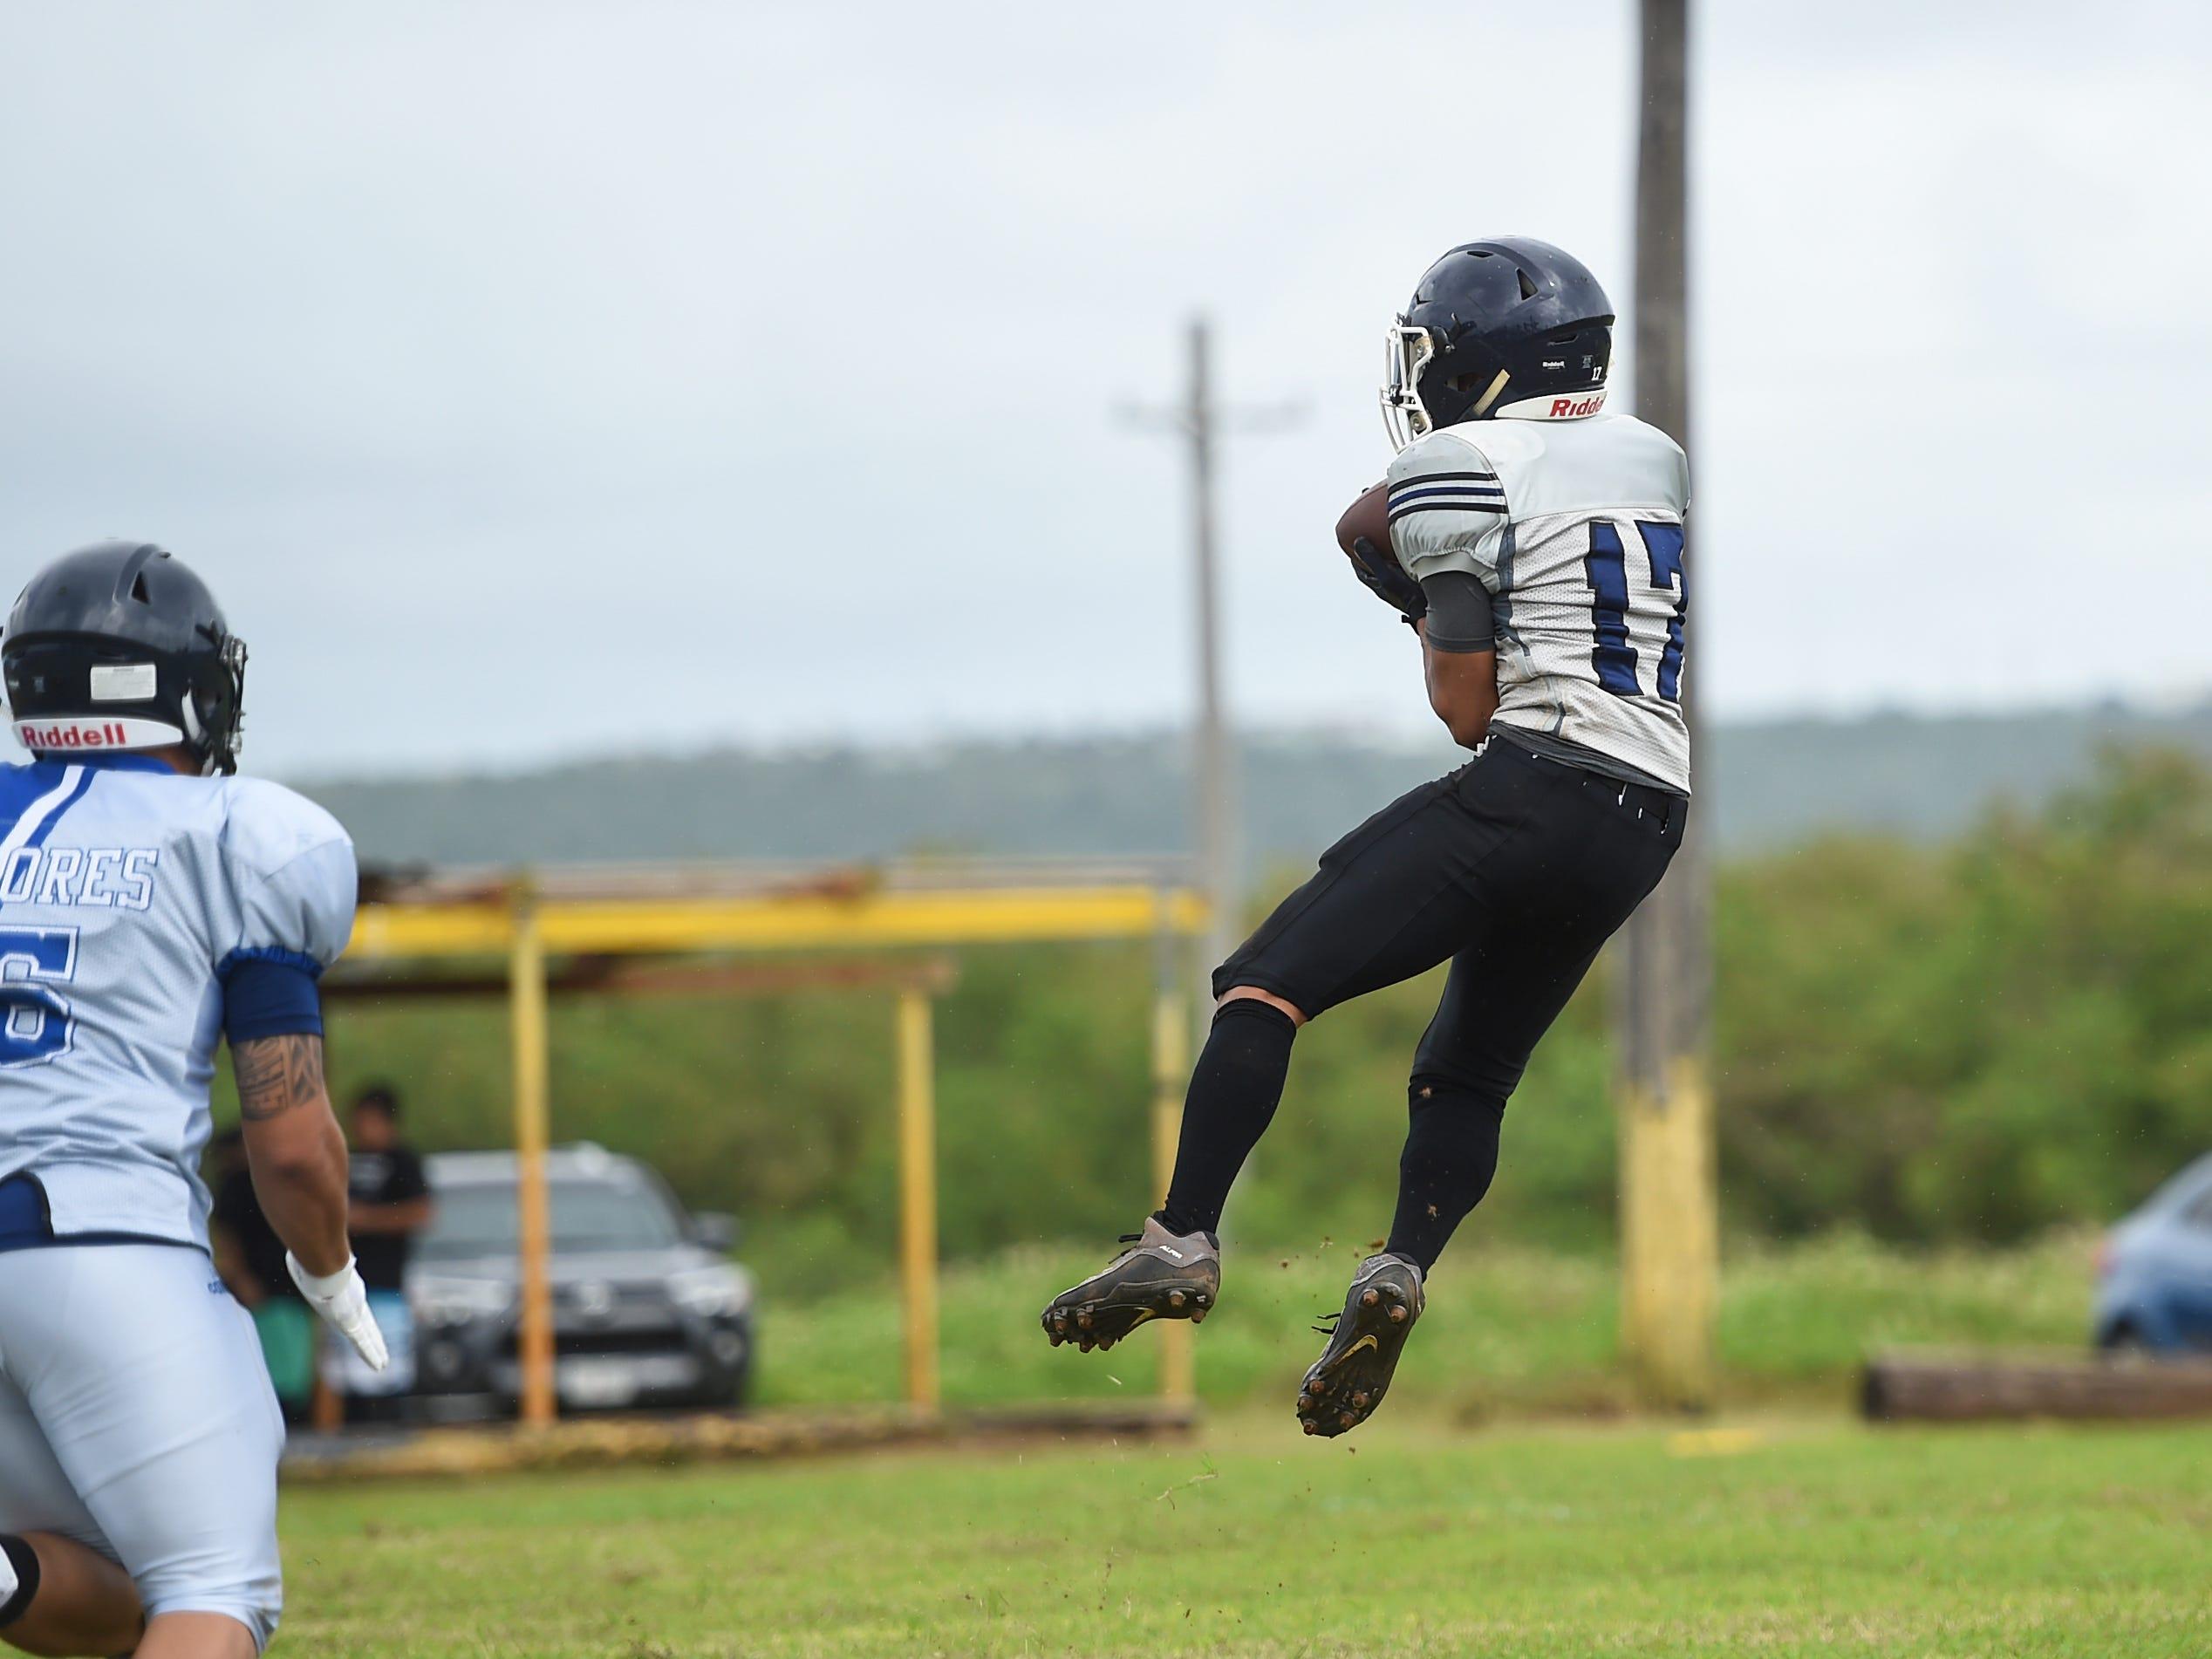 Guam Raiders player Spade Untalan (17) makes a catch against the Southern Cowboys during their Budweiser Guahan Varsity Football League game at Eagles Field in Mangilao, Feb. 2, 2019.